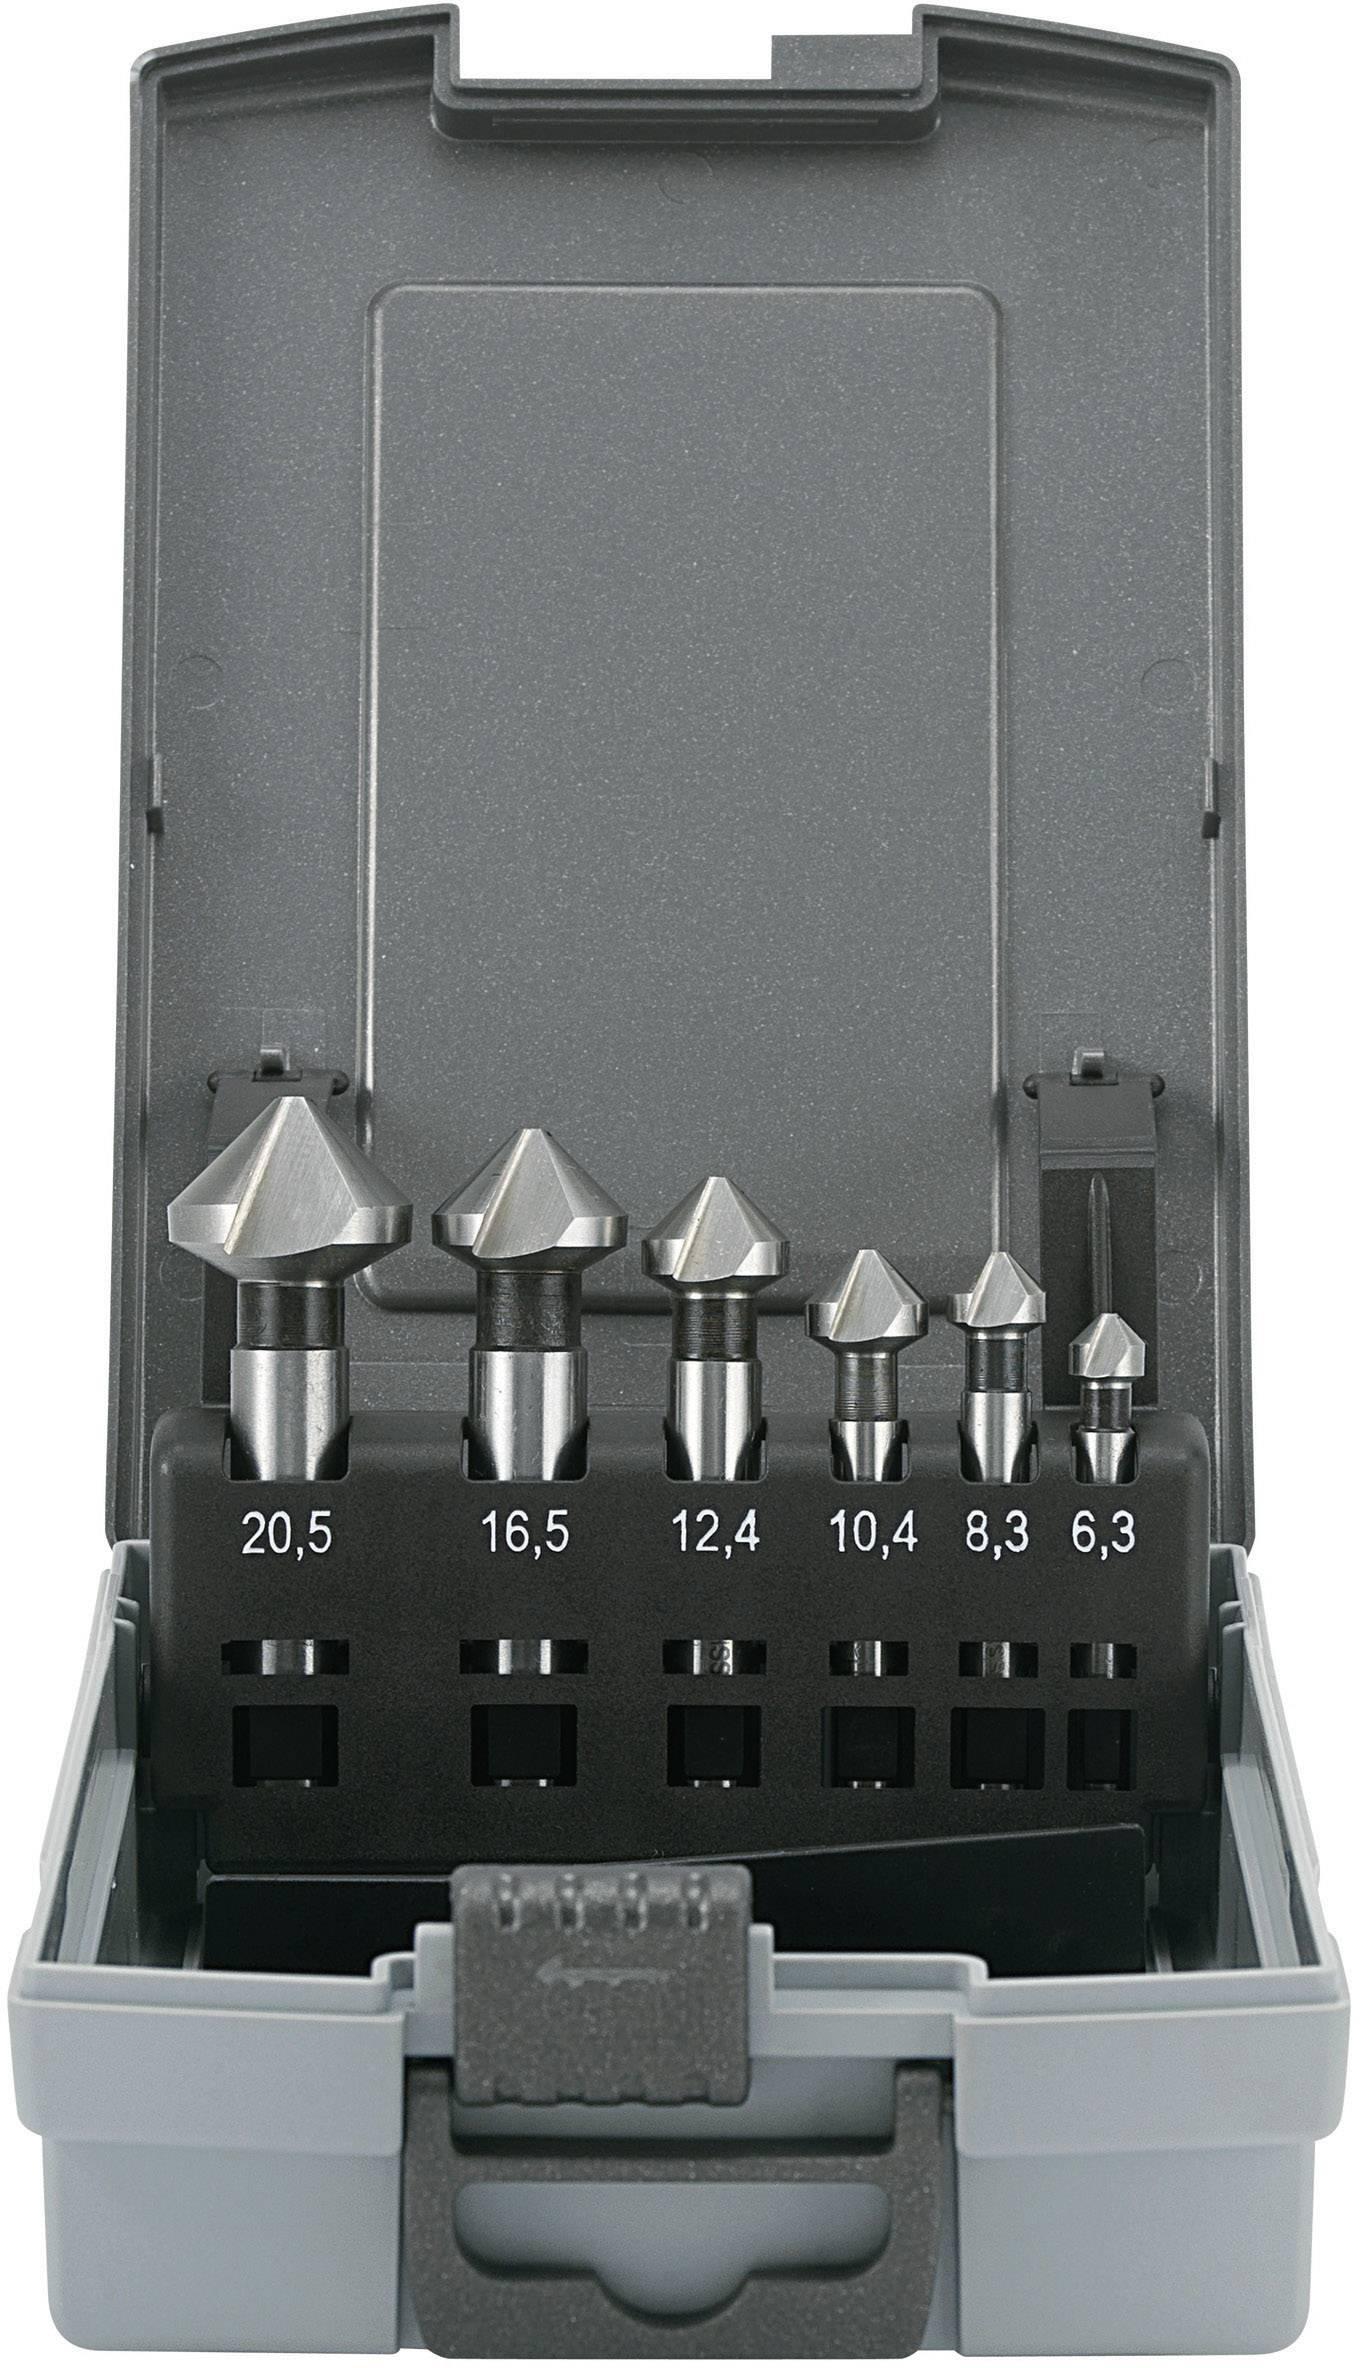 Sada kužeľových záhlbníkov 6-dielna HSS TOOLCRAFT 821394, valcová stopka, 6.3 mm, 8.3 mm, 10.4 mm, 12.4 mm, 16.5 mm, 20.5 mm, 1 sada